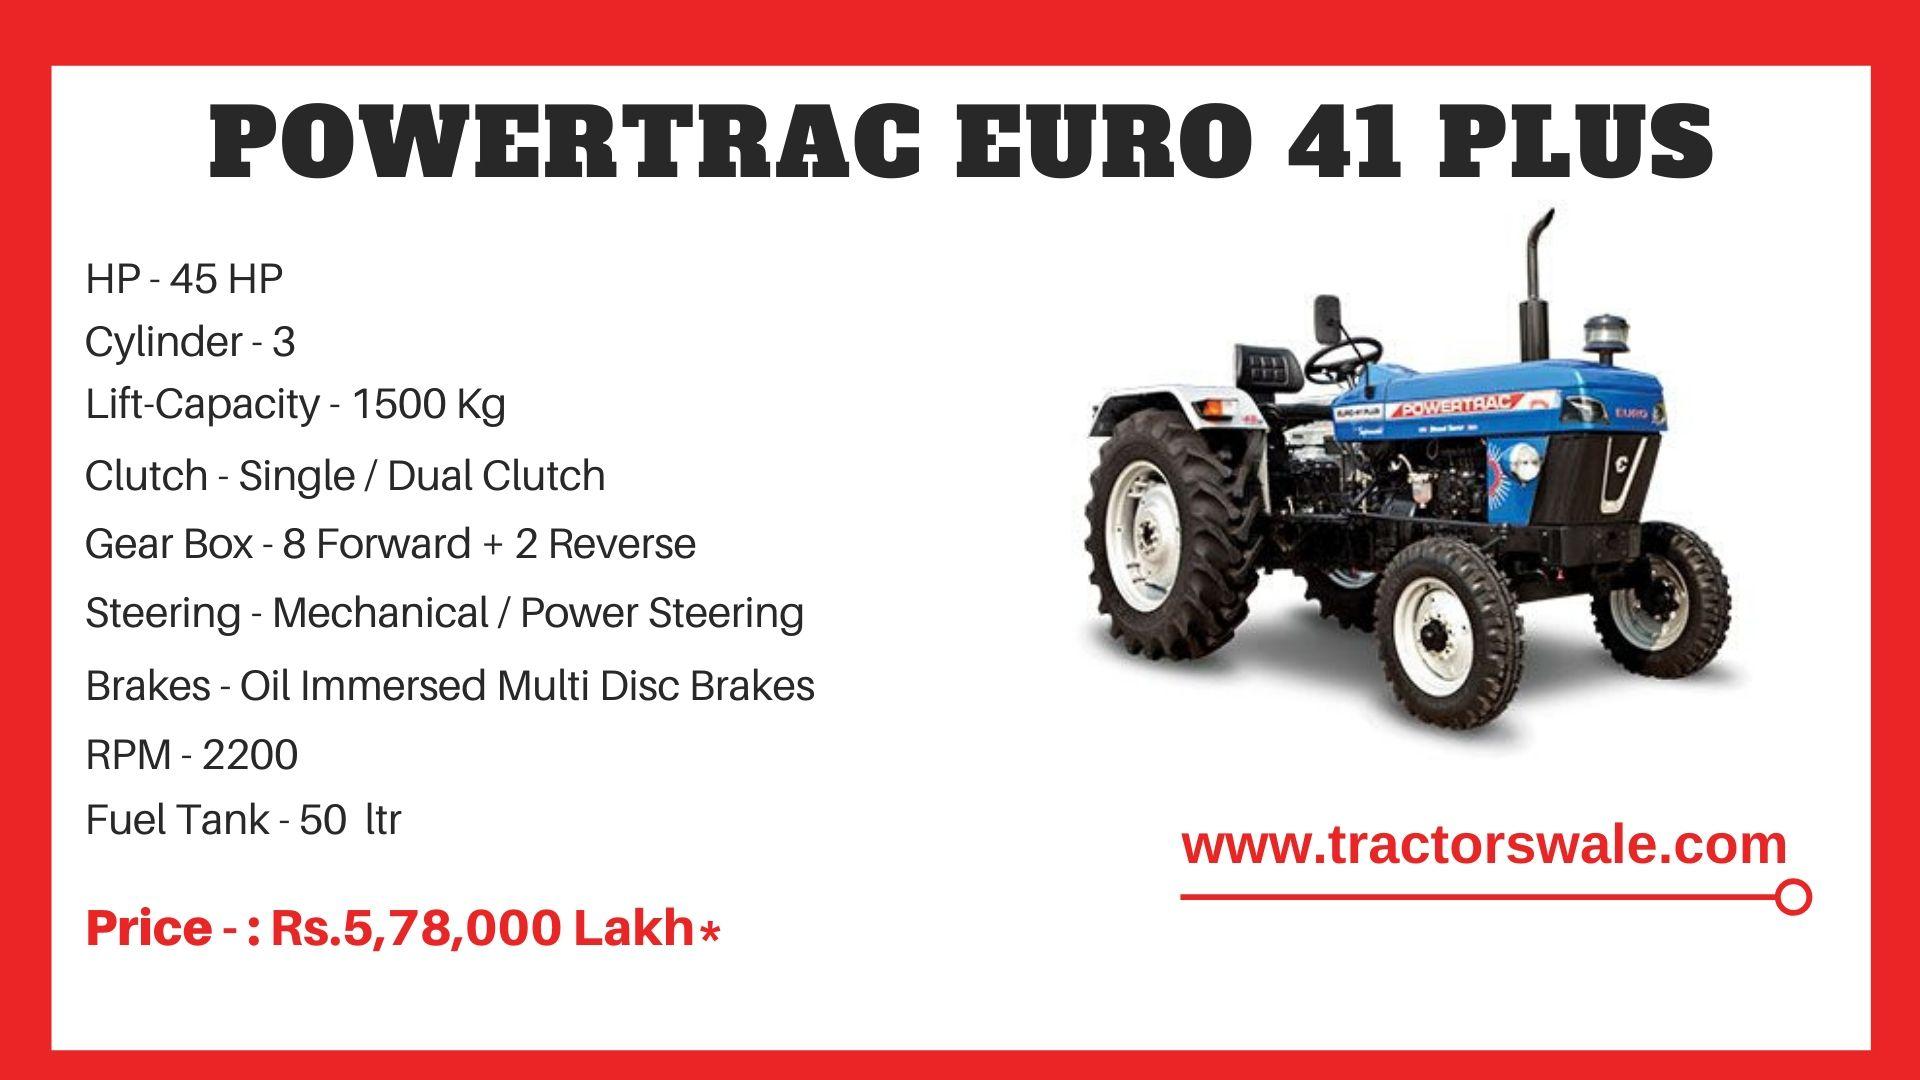 PowerTrac Euro 41 Plus Tractor Price